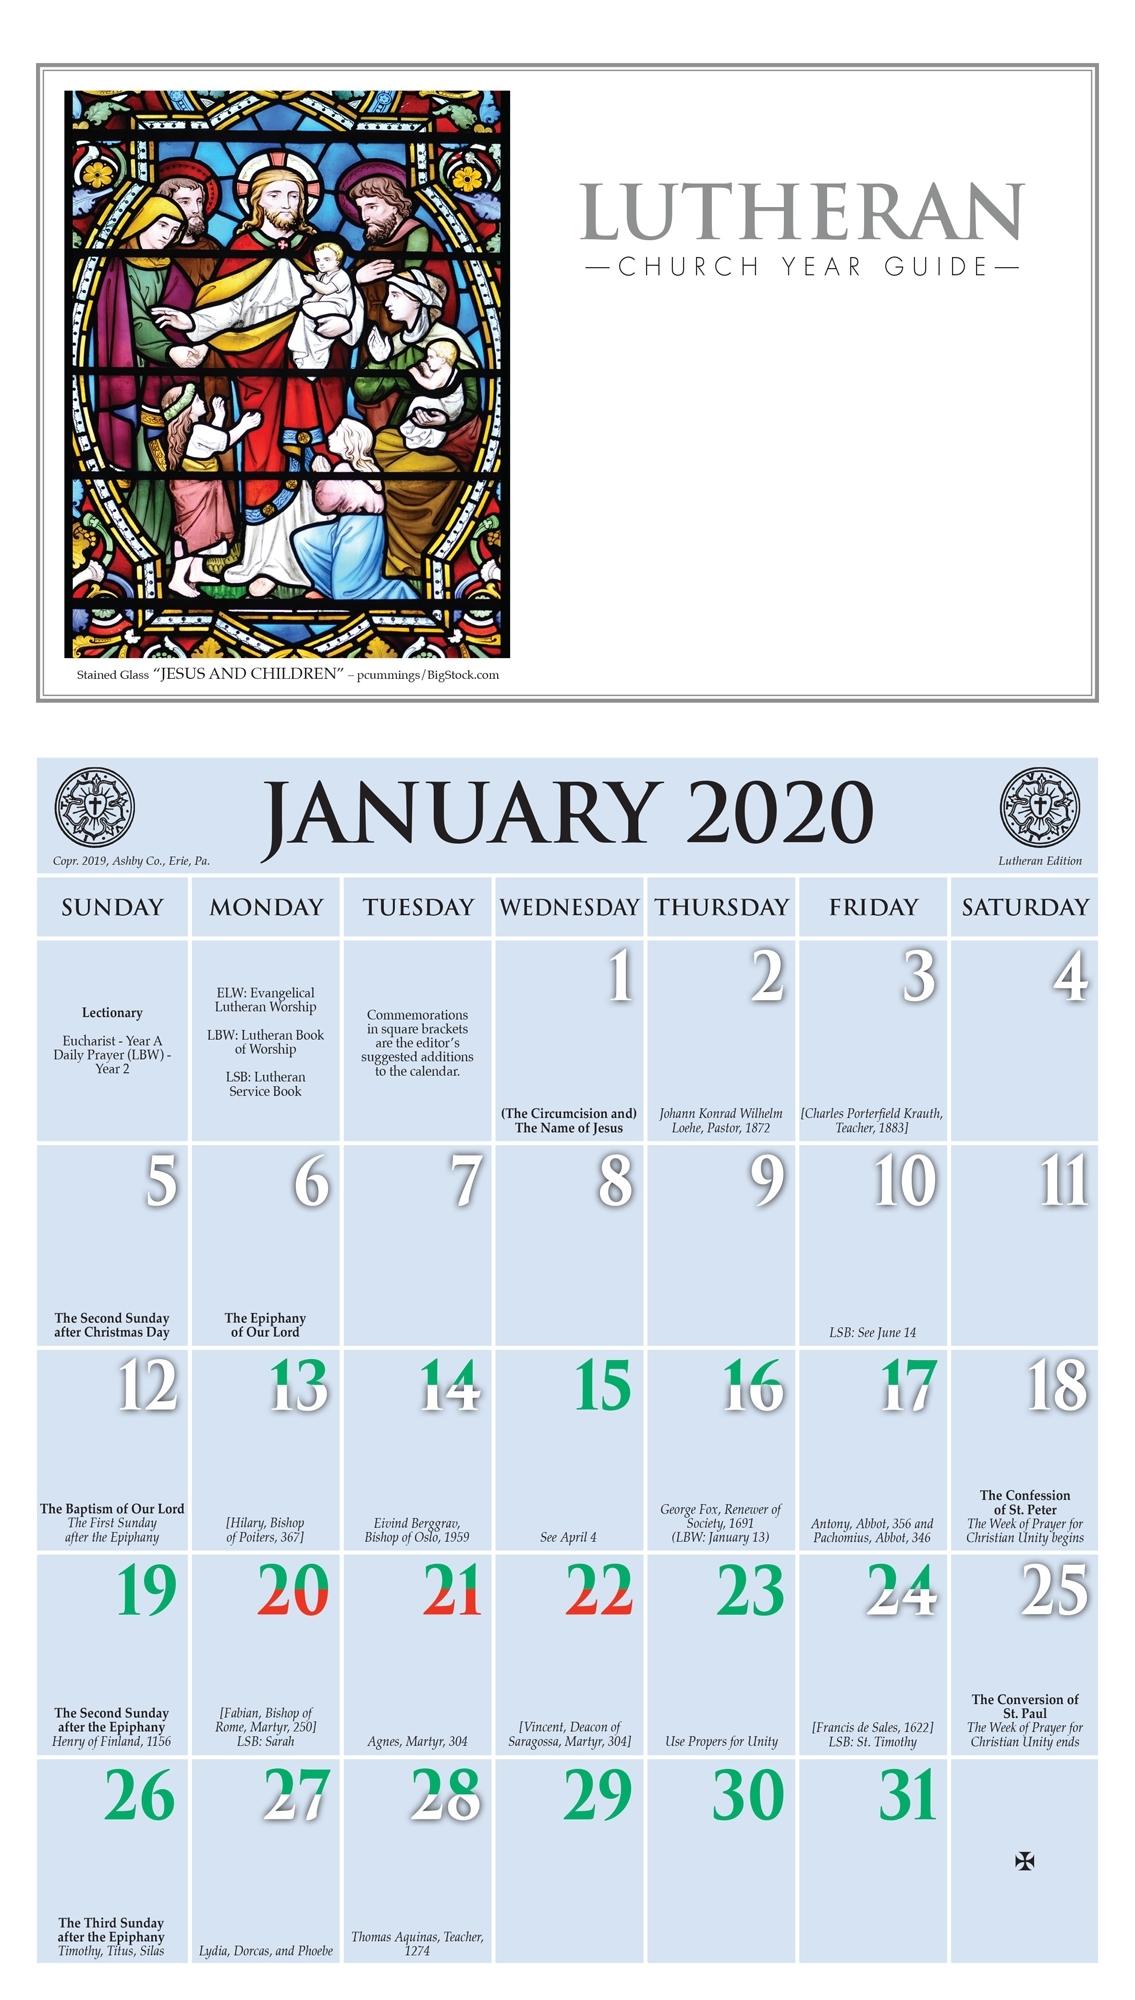 2020 Church Year Calendar in Year A Liturgical Calendar 2020